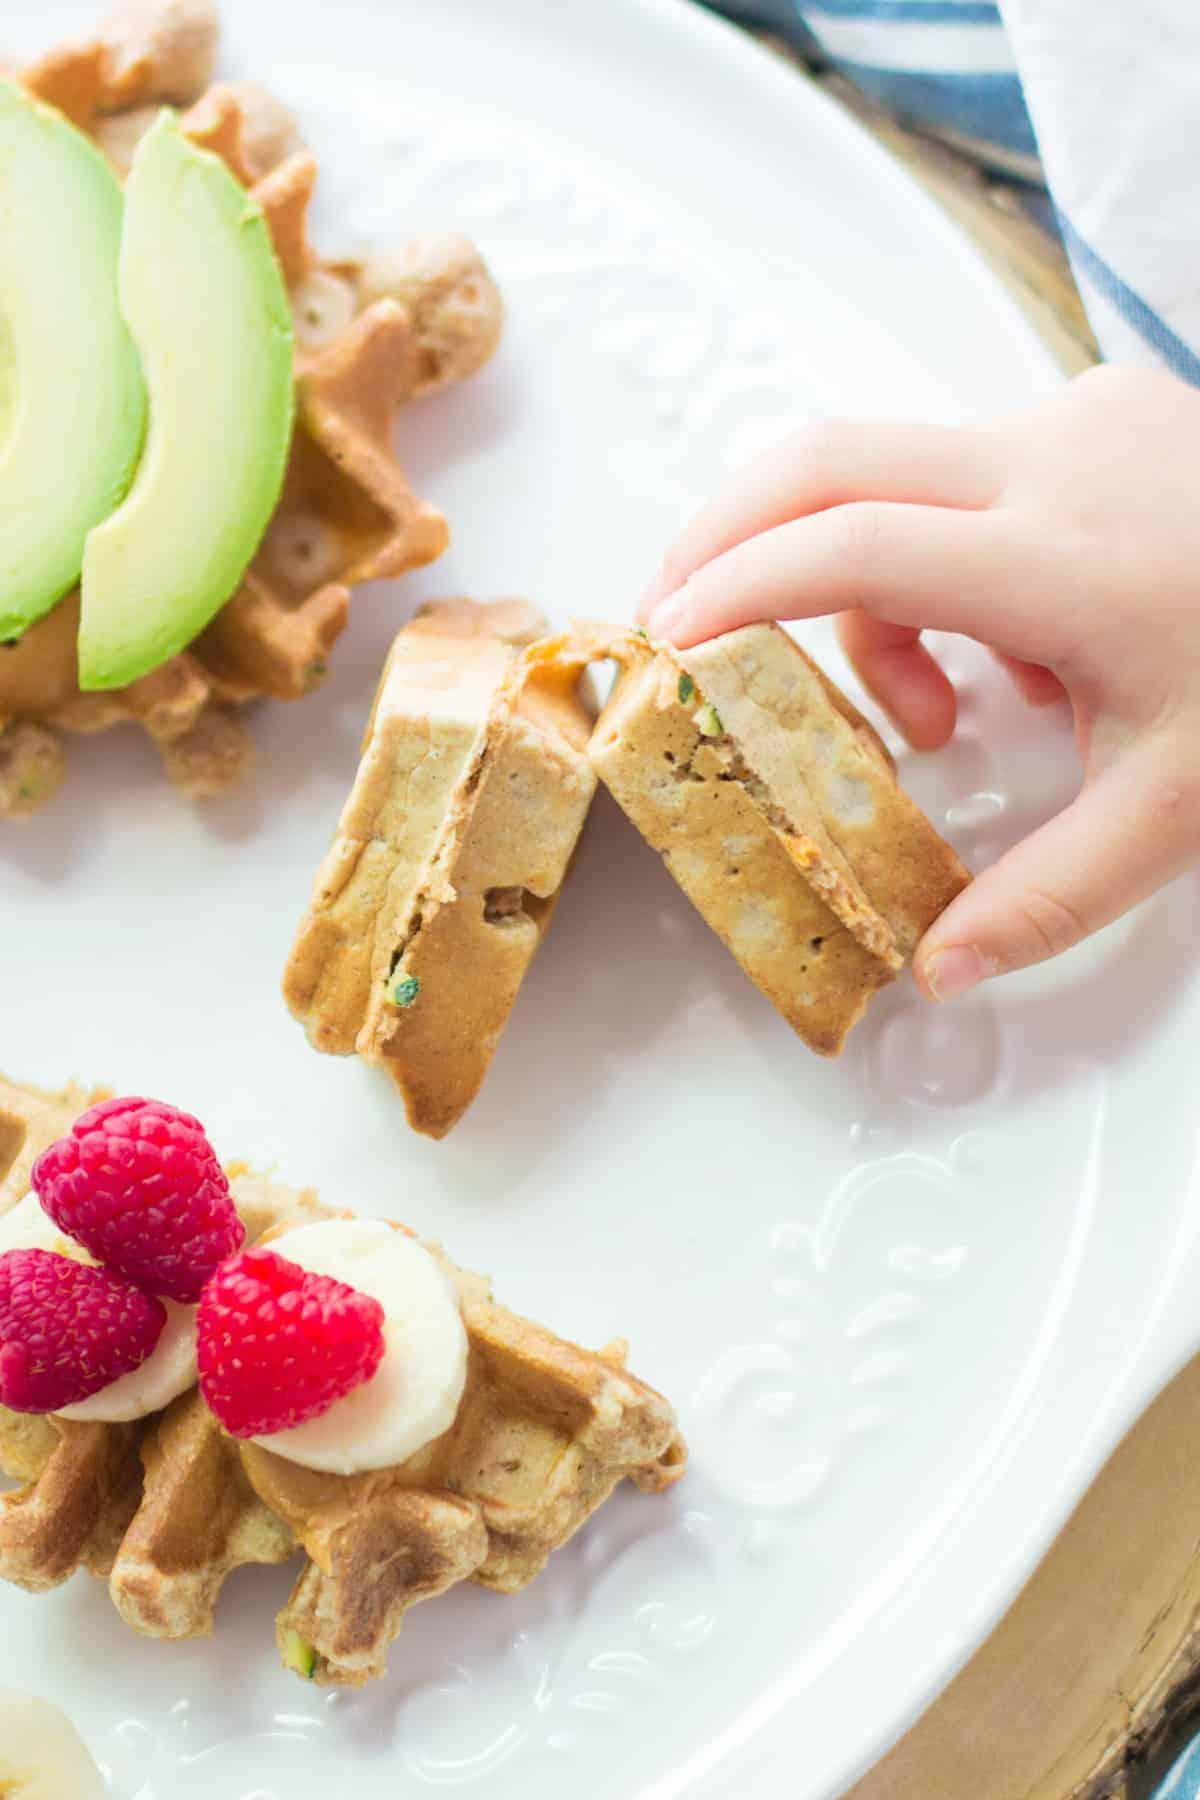 a toddler hand grabbing a waffle piece